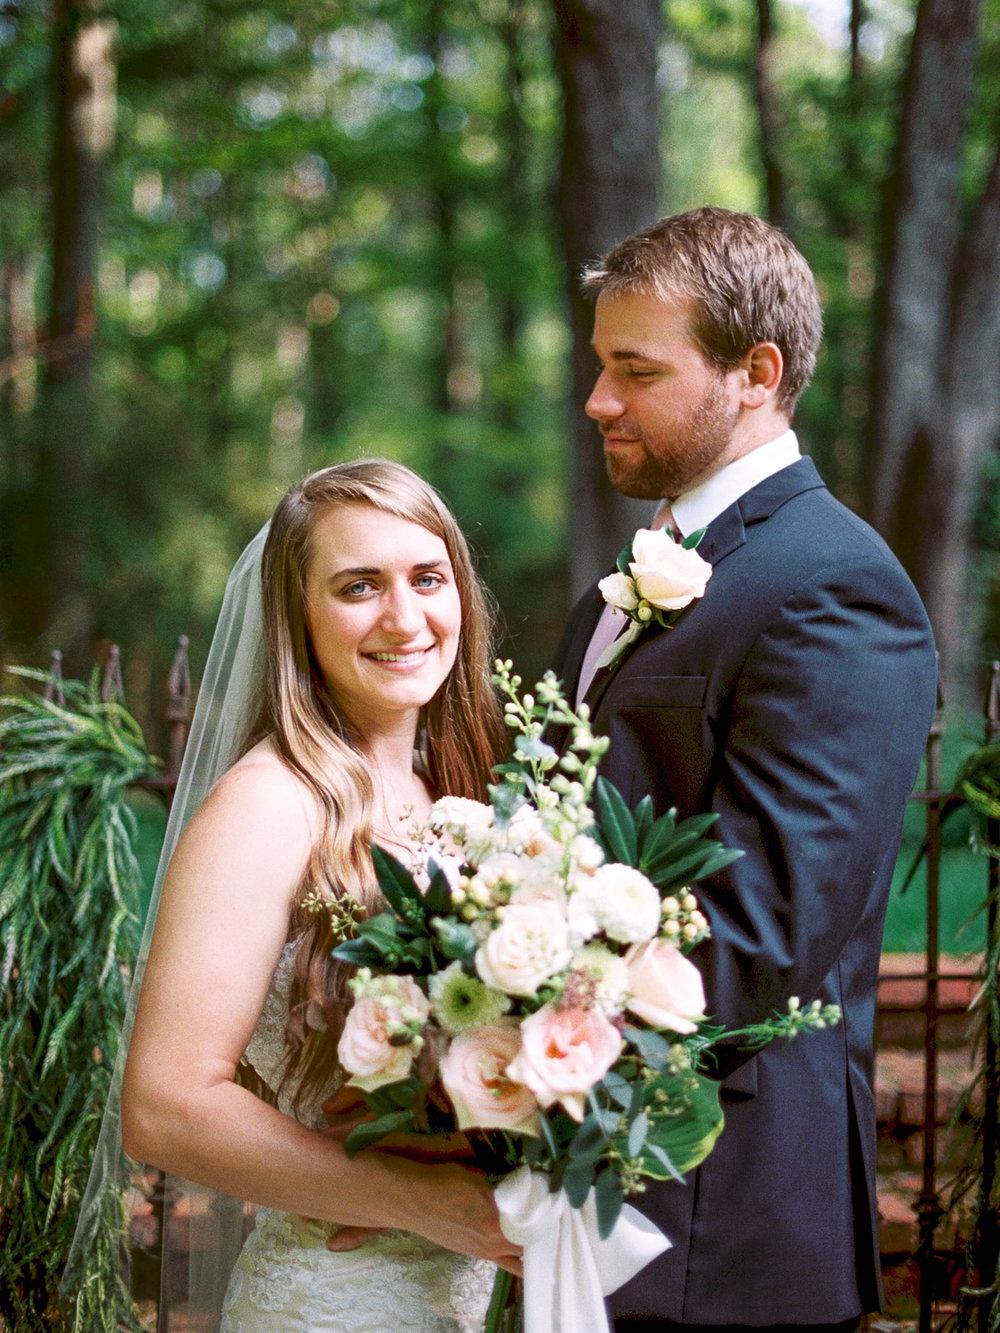 christinadavisphotography-romanticwedding-gardenweddinginspiration36.jpg